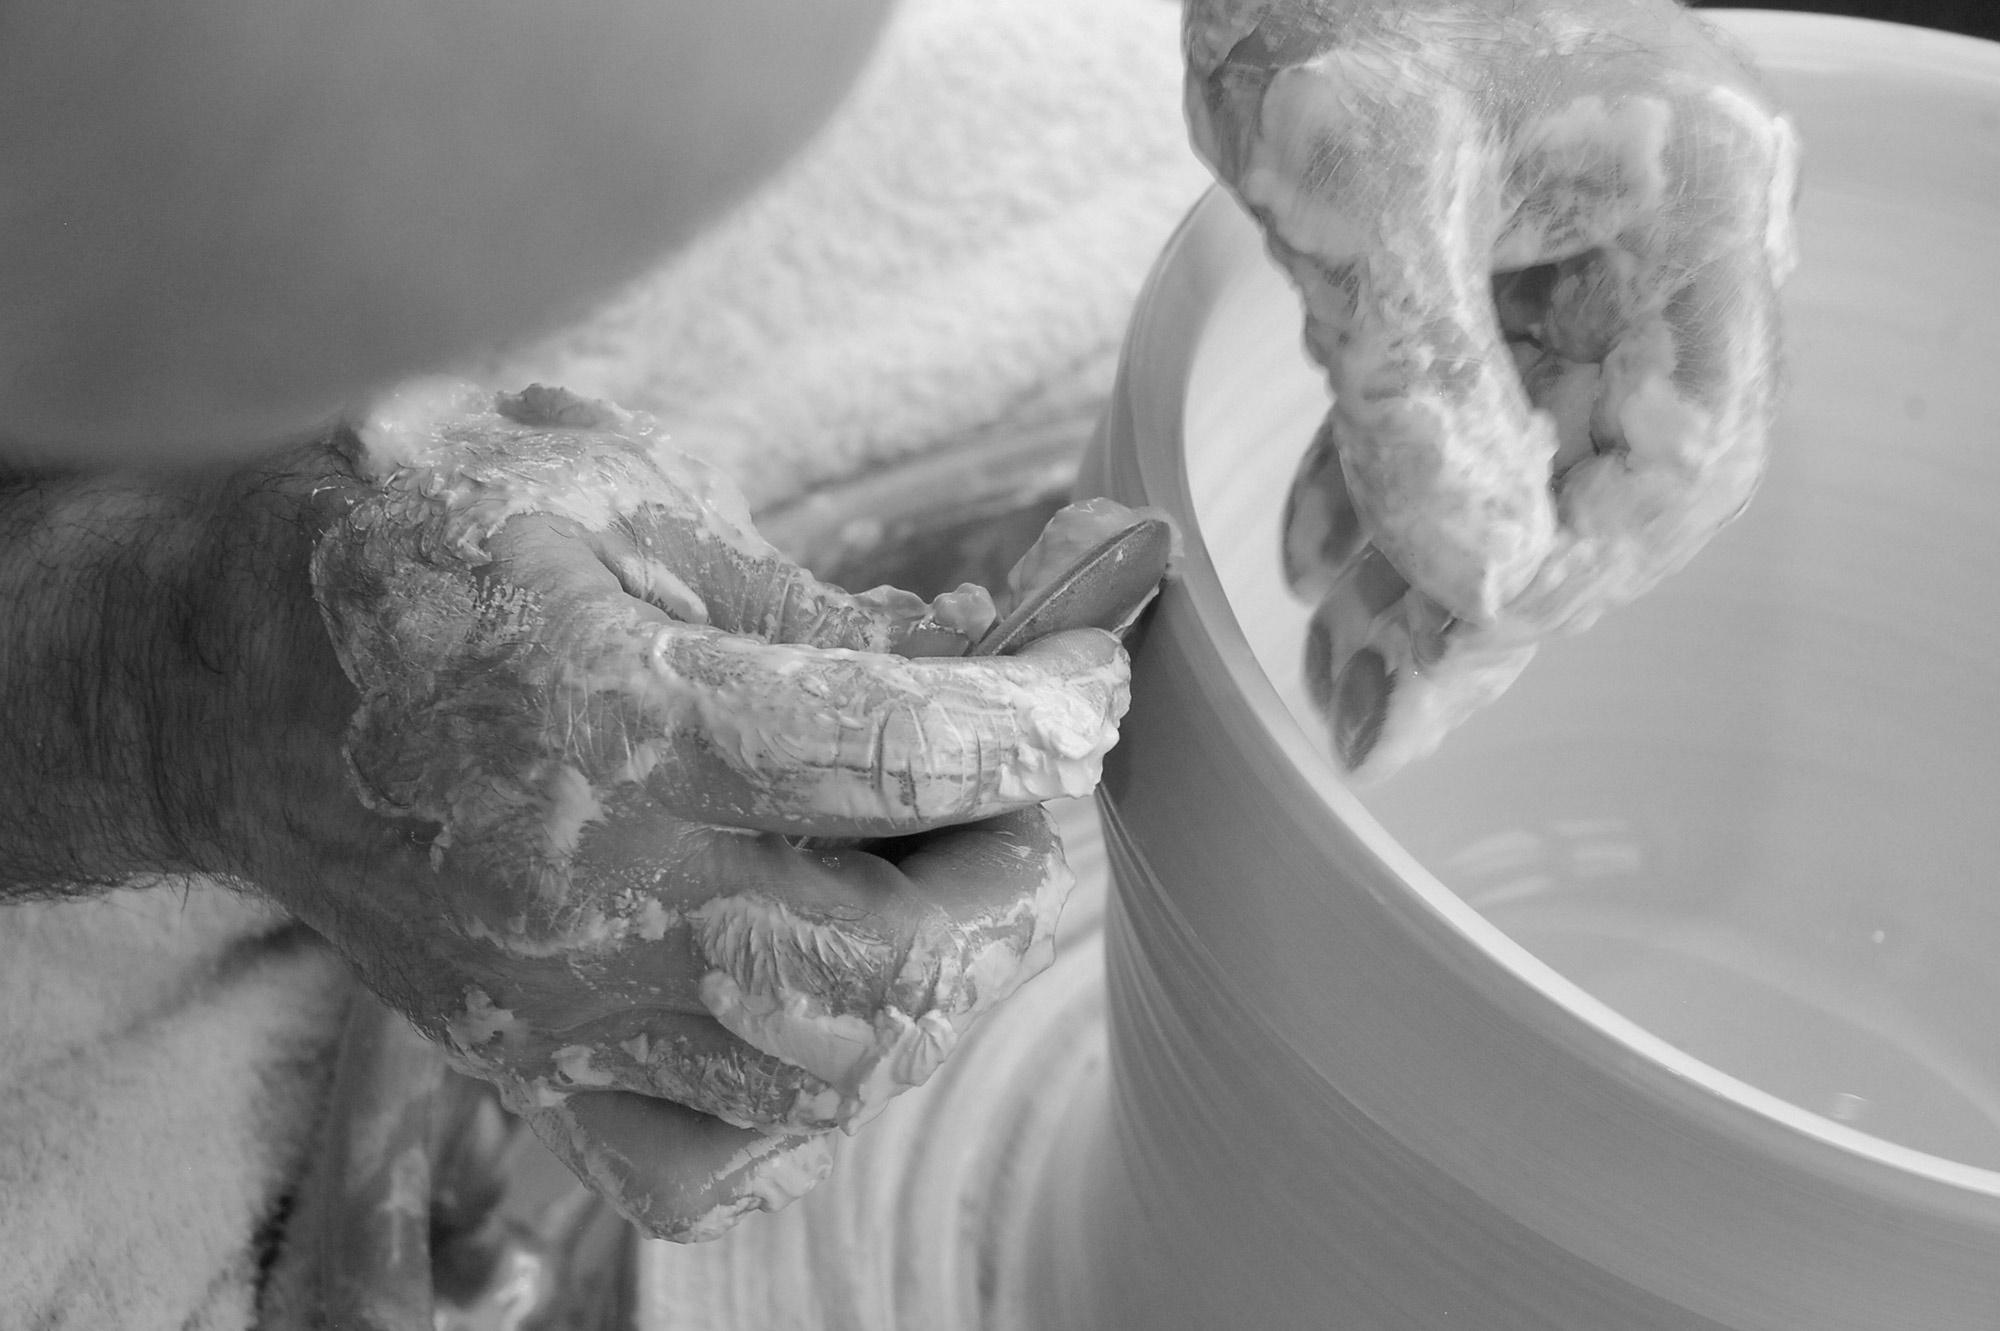 doherty-porcelain-Jacks-hands.jpg